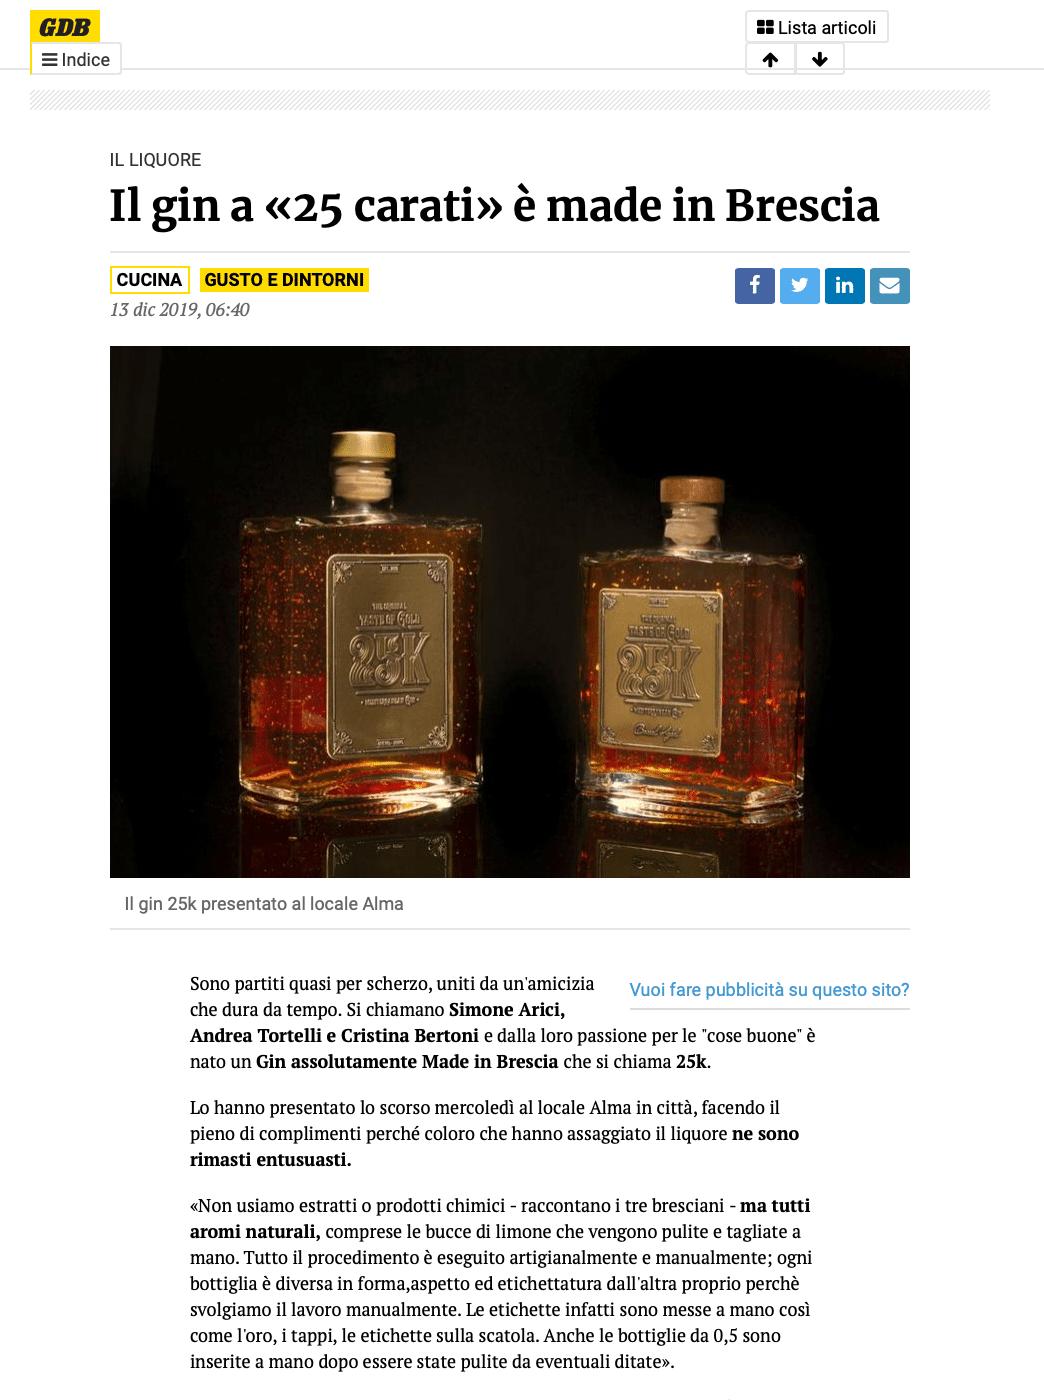 "The Gin  ""25 carat"" is made in Brescia gin"